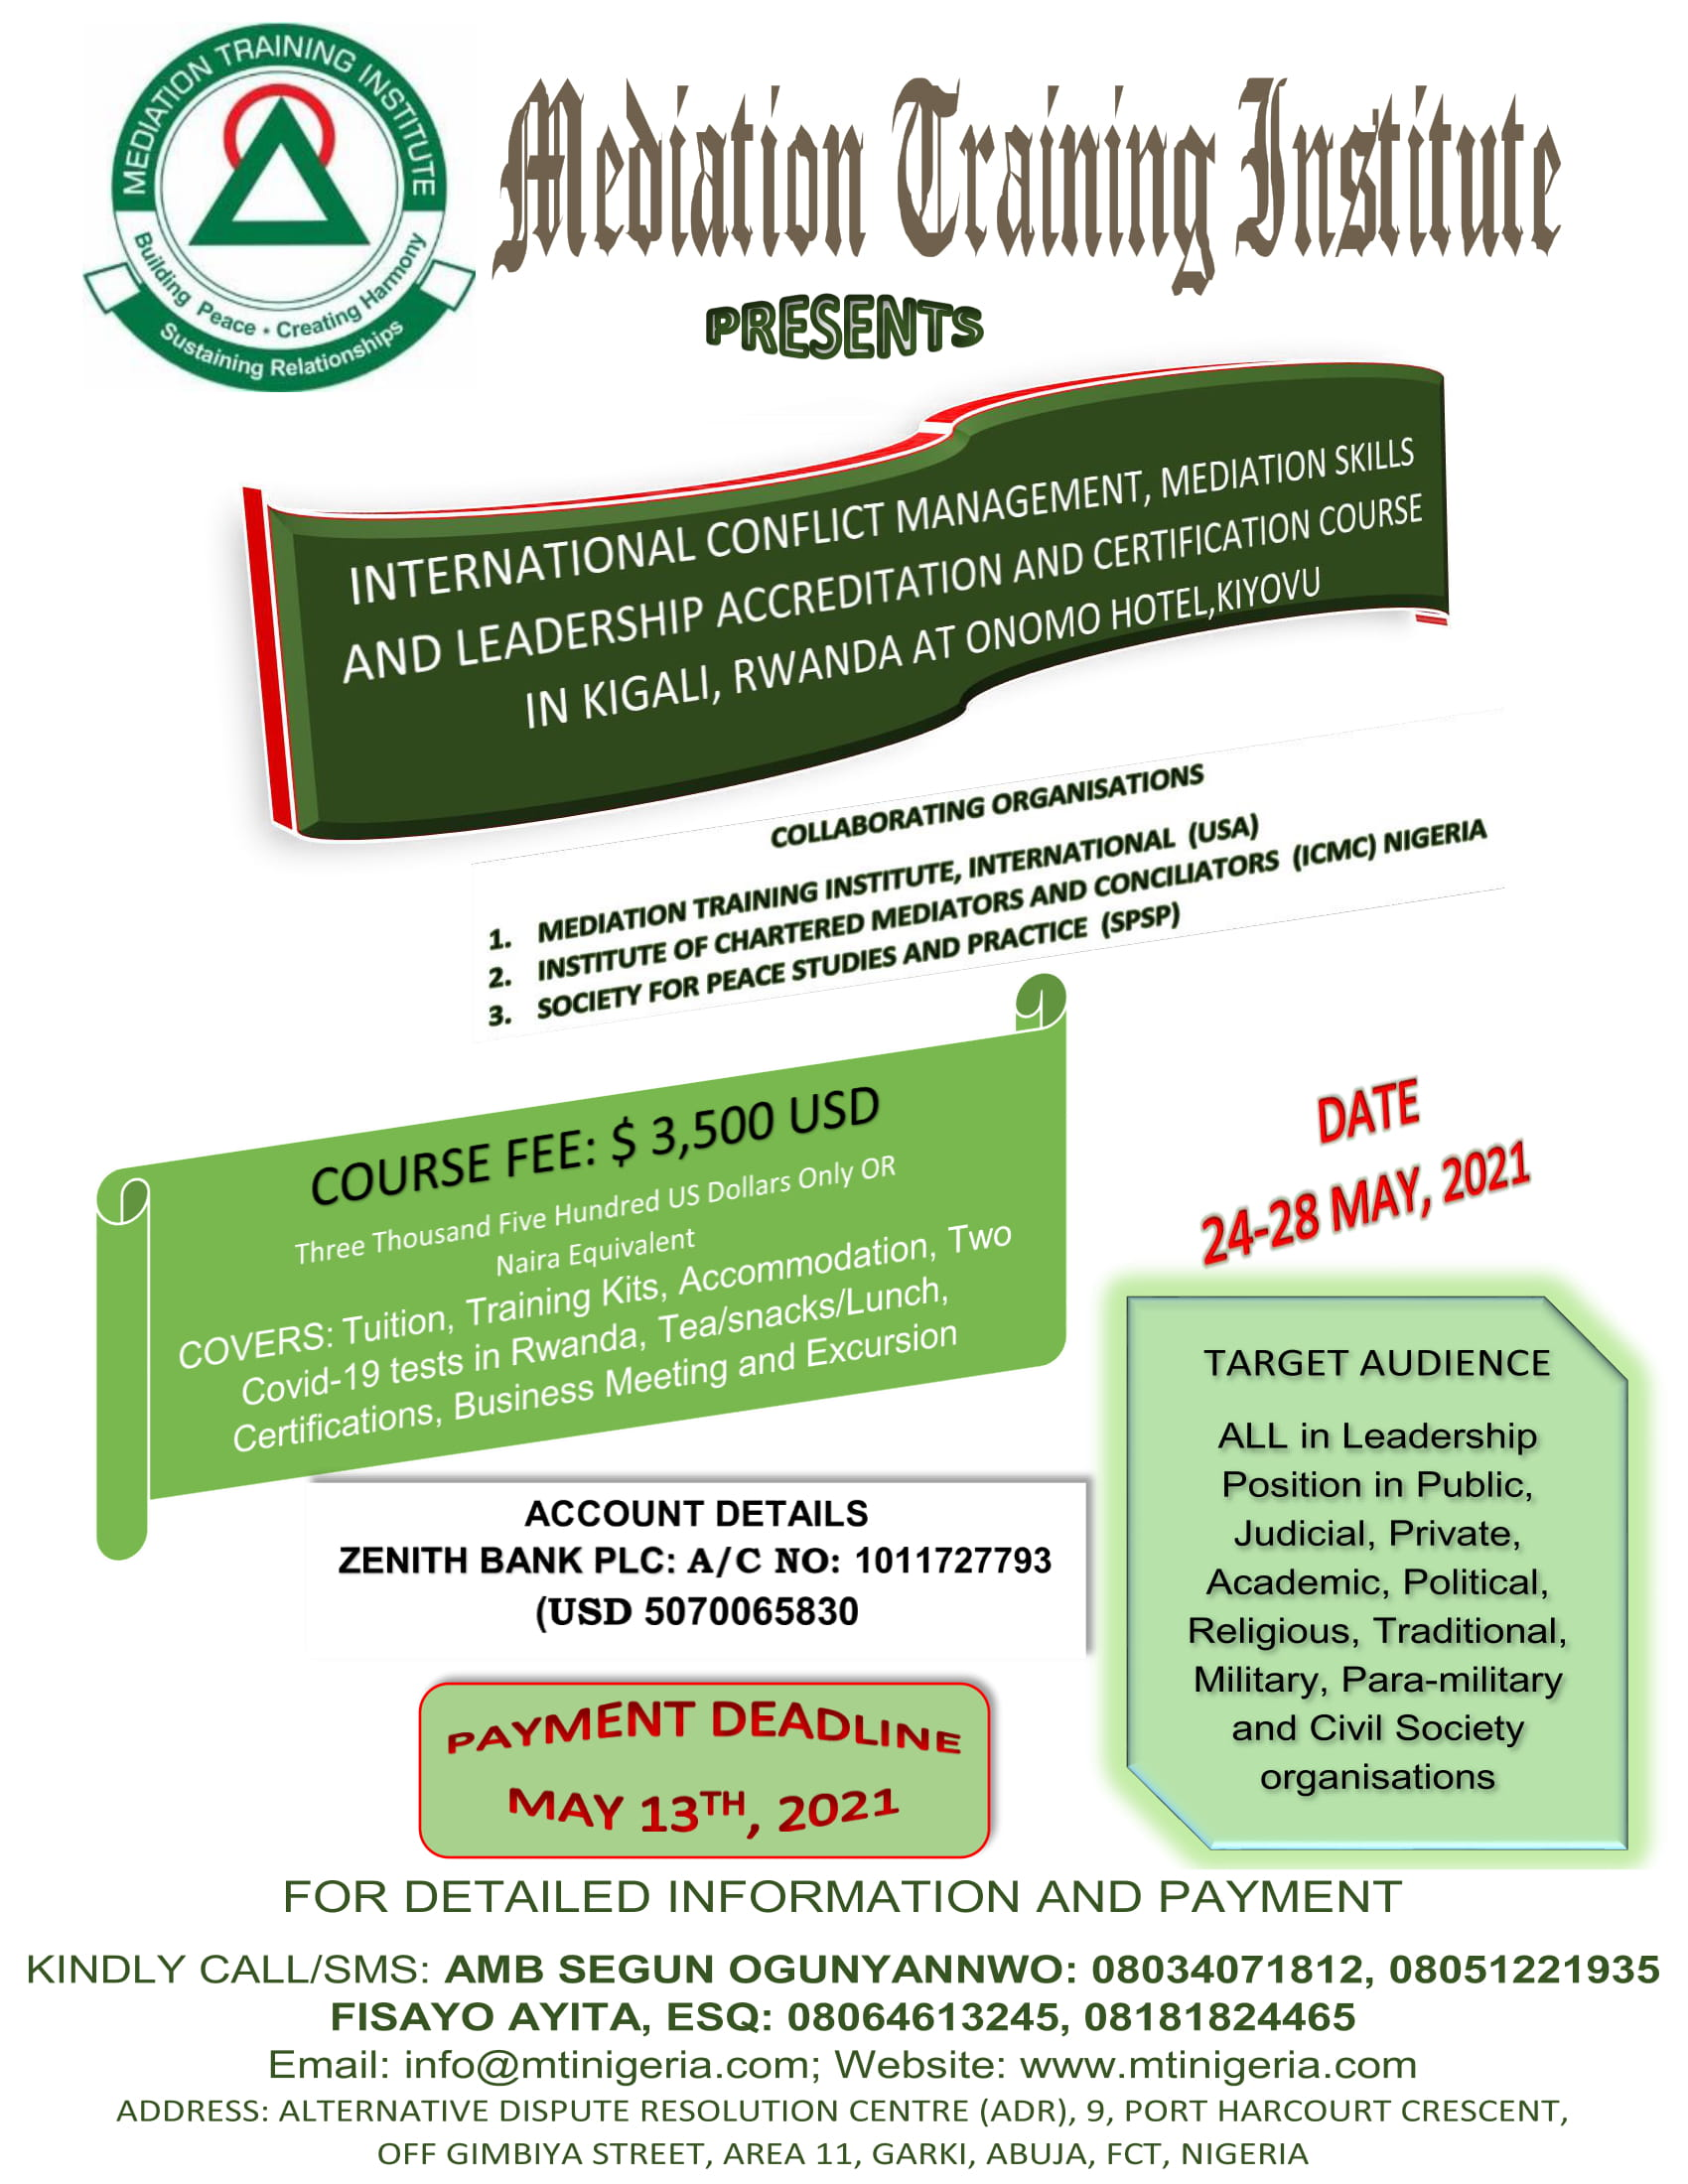 INTERNATIONAL CONFLICT MANAGEMENT, MEDIATION SKILLS AND LEADERSHIP ACCREDITATION & CERTIFICATION COURSE IN KIGALI, RWANDA